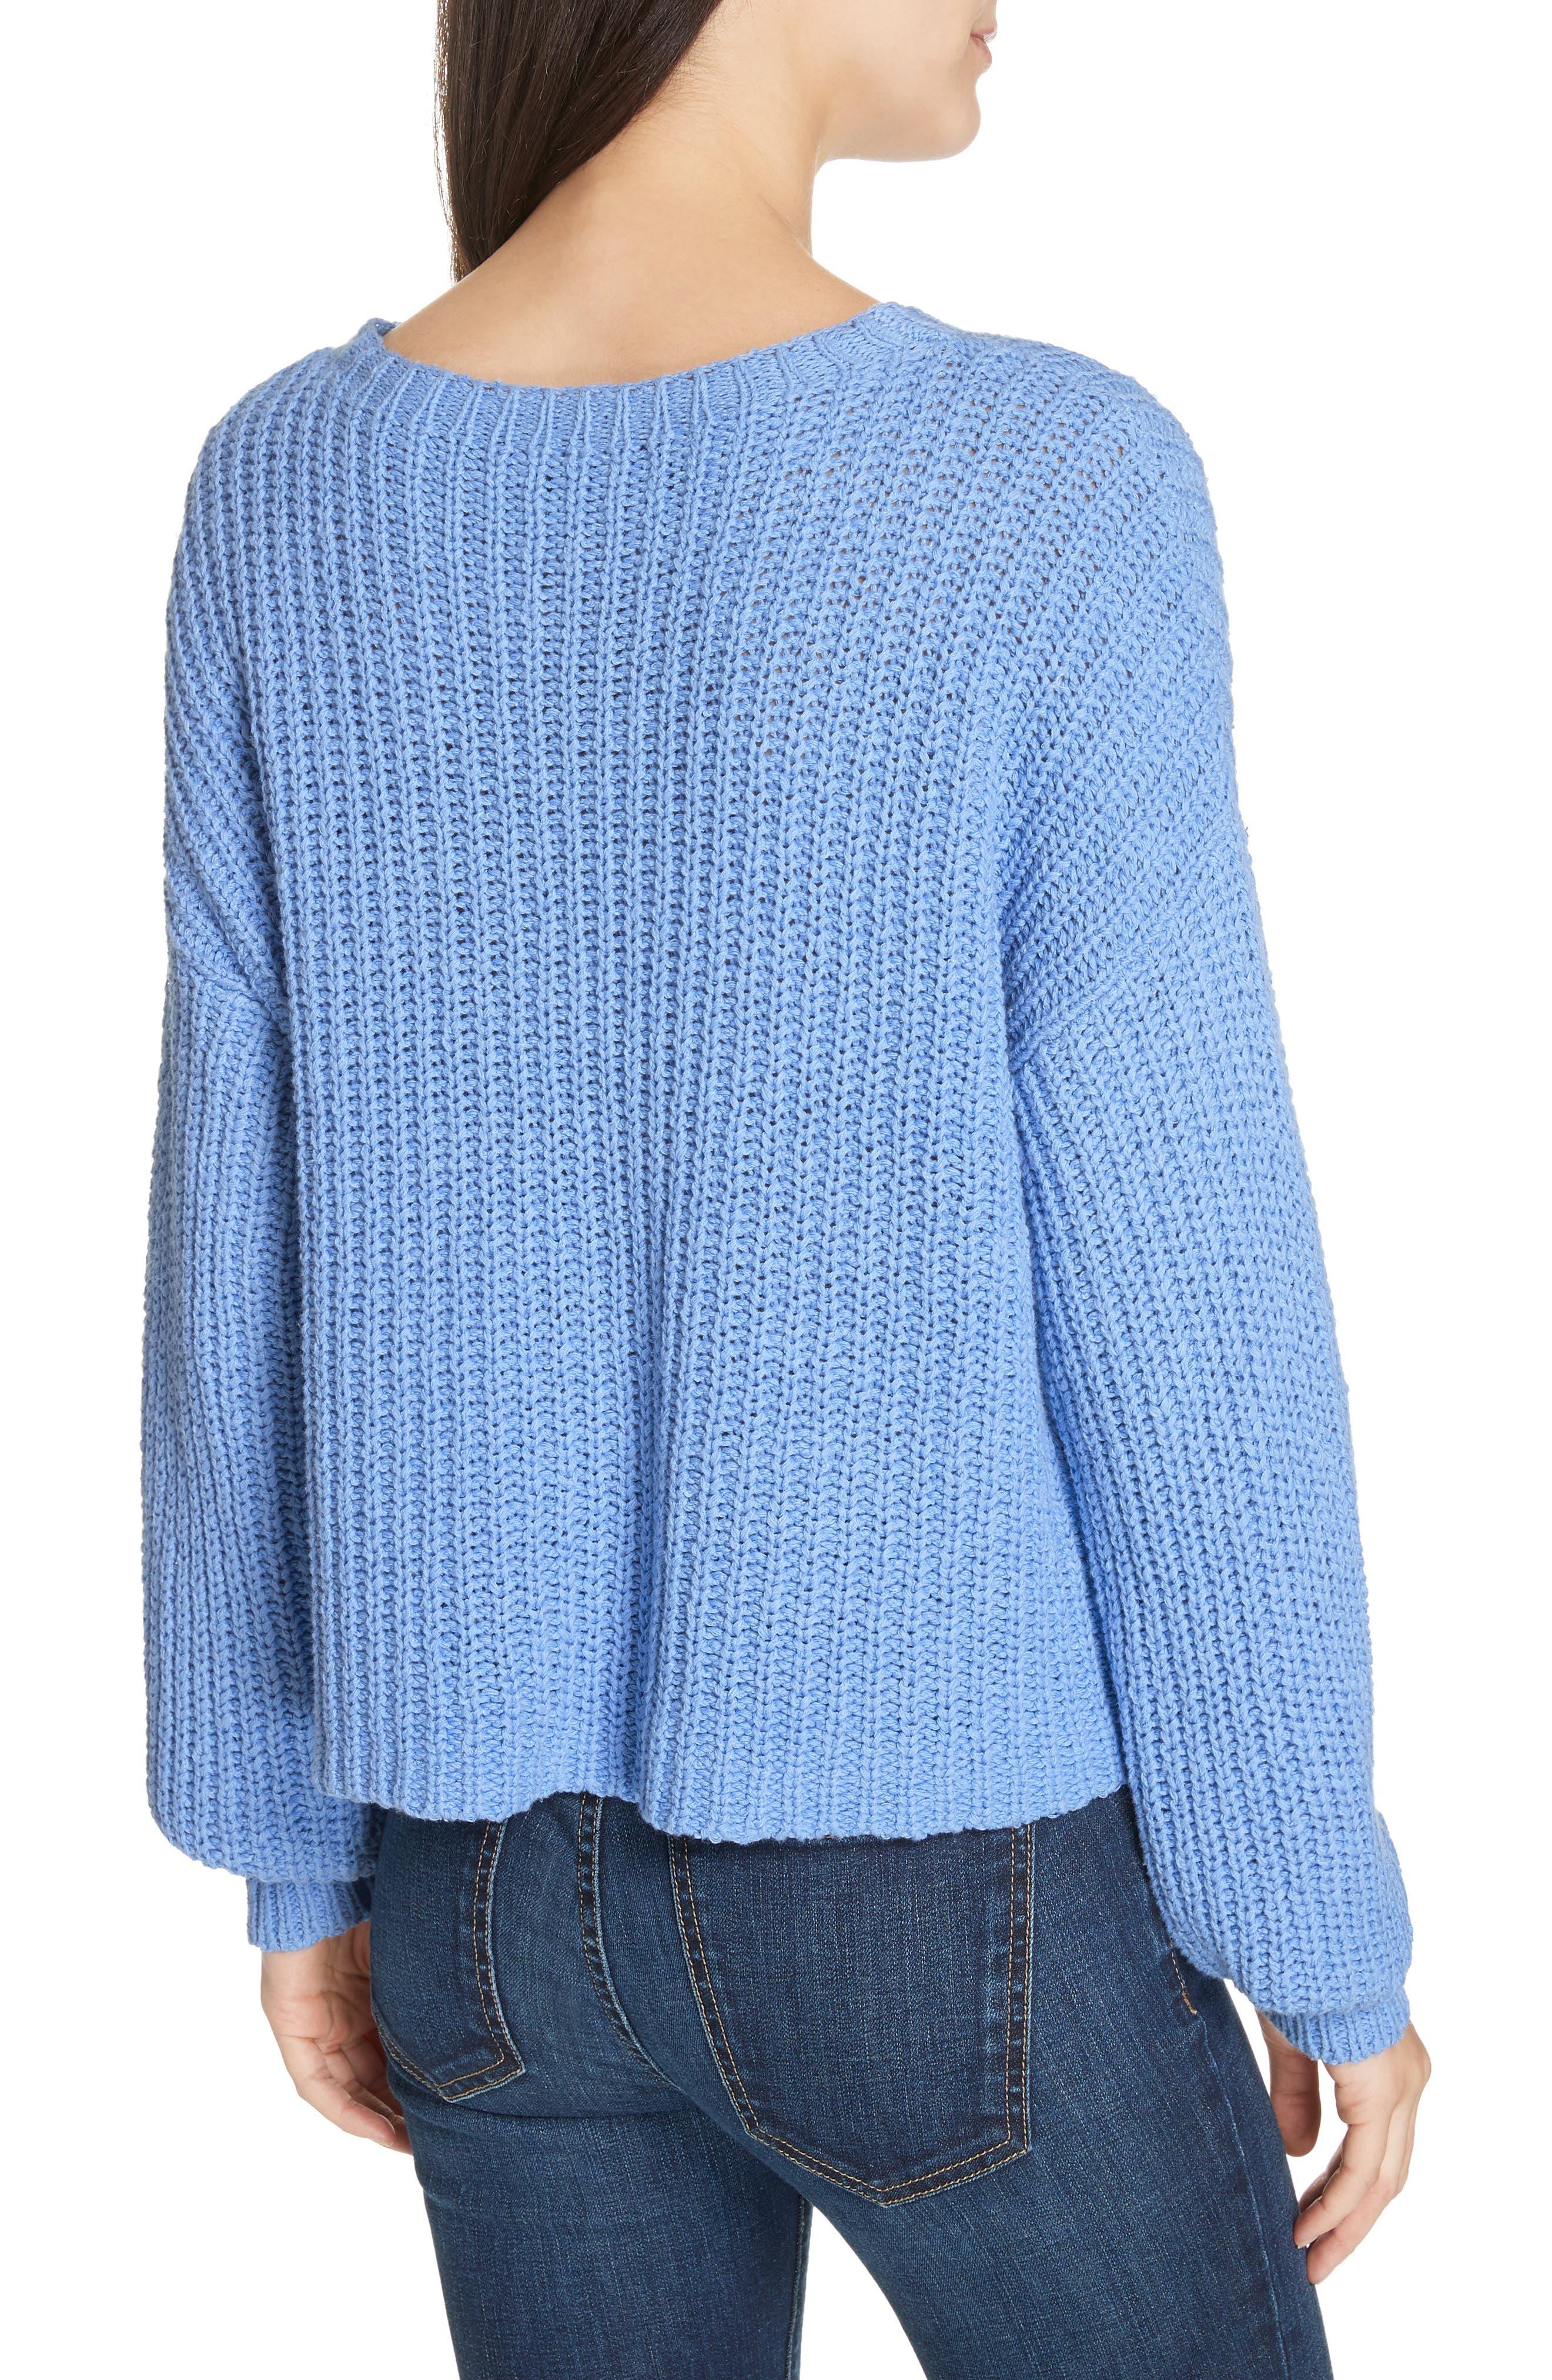 EILEEN FISHER,                             Crewneck Crop Shaker Sweater,                             Alternate thumbnail 2, color,                             BLUEBIRD